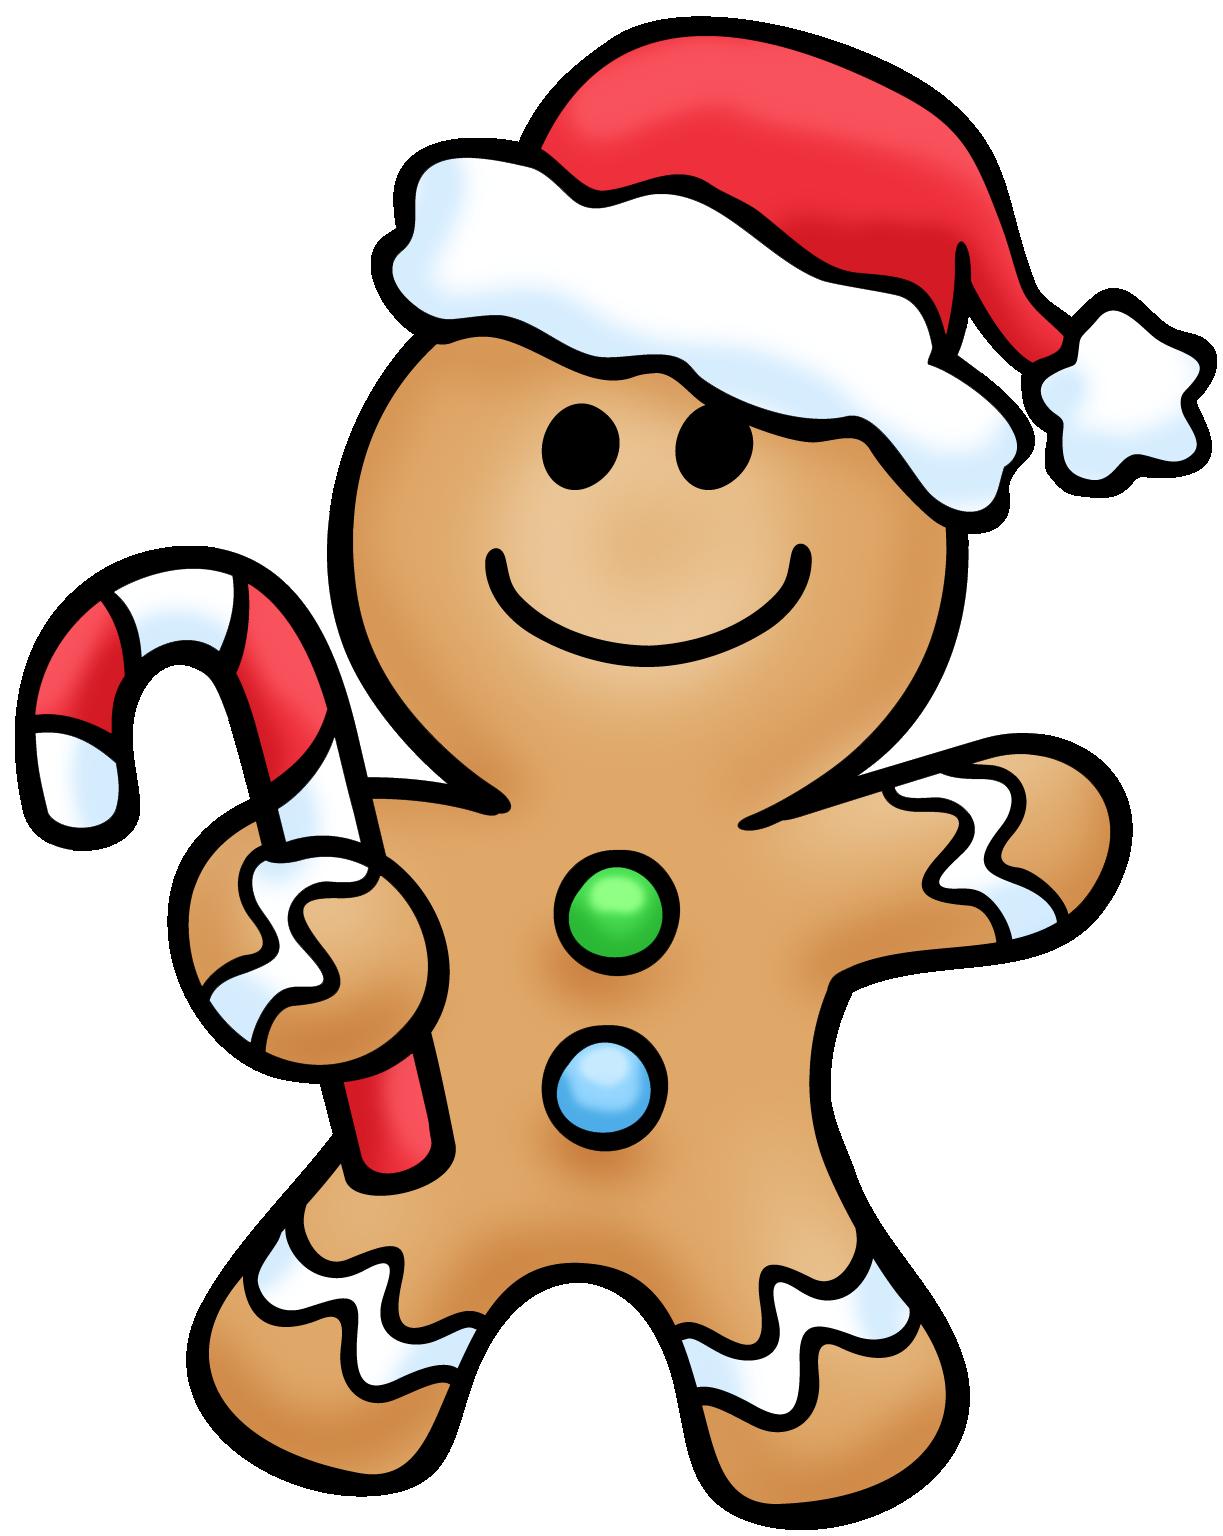 Pin By Becki Holt On Imagenes Teachers Gingerbread Man Drawing Gingerbread Man Preschool Christmas